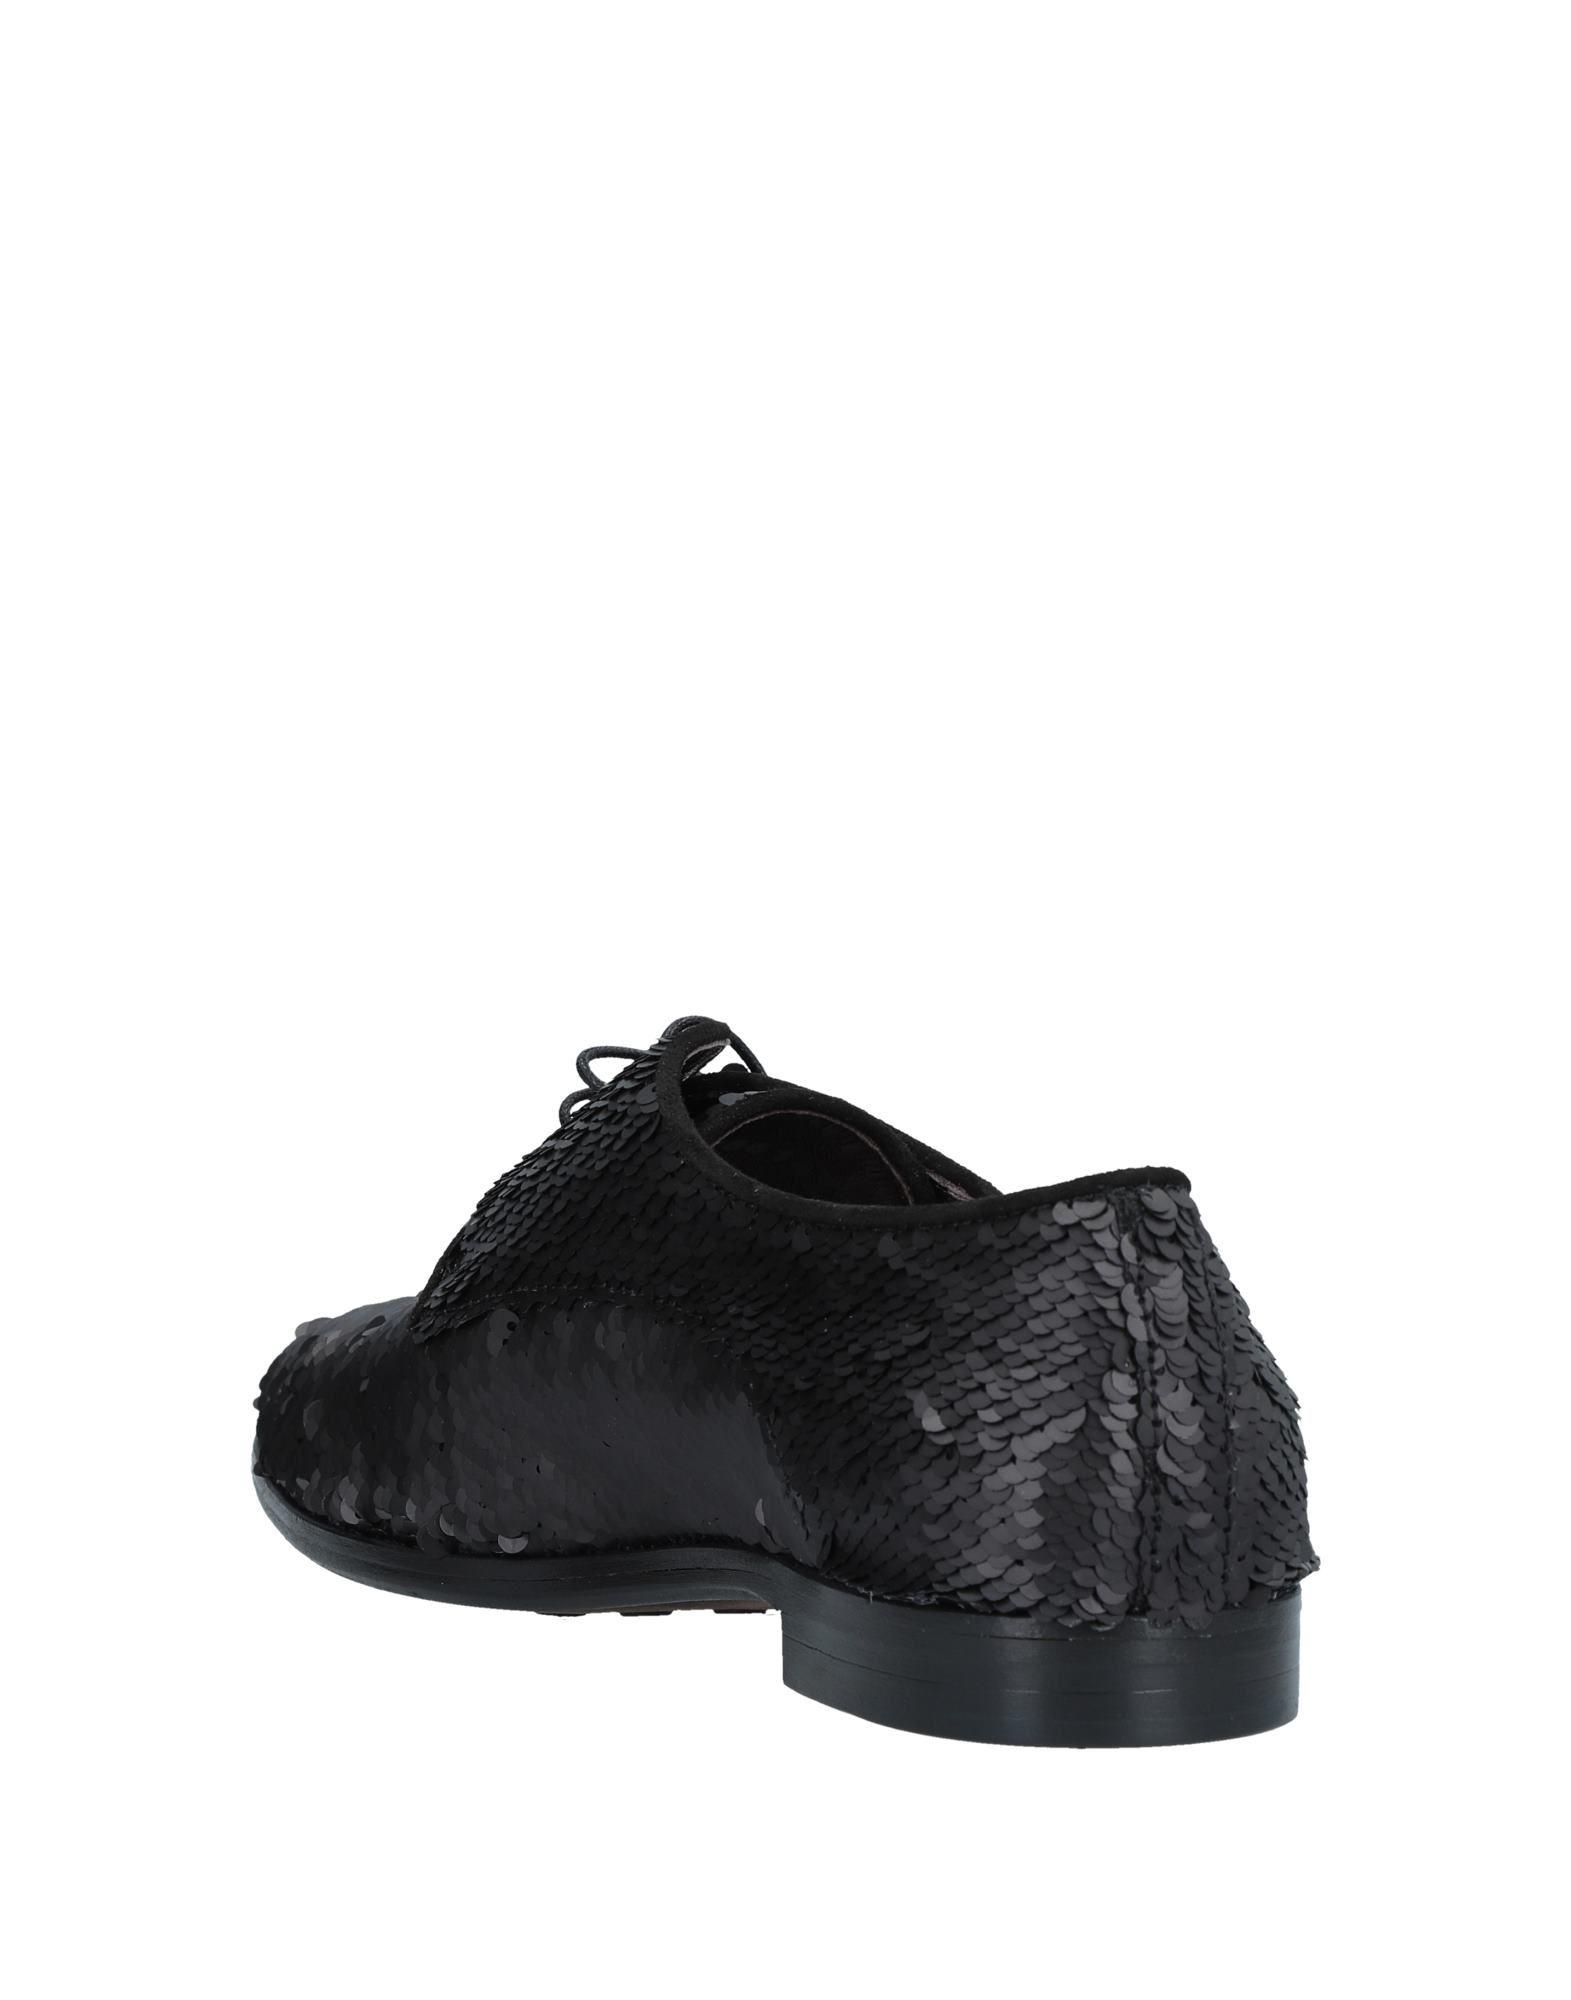 Stilvolle billige Schuhe Agl  Attilio Giusti Leombruni Schnürschuhe Damen  Agl 11539951DV c8019b